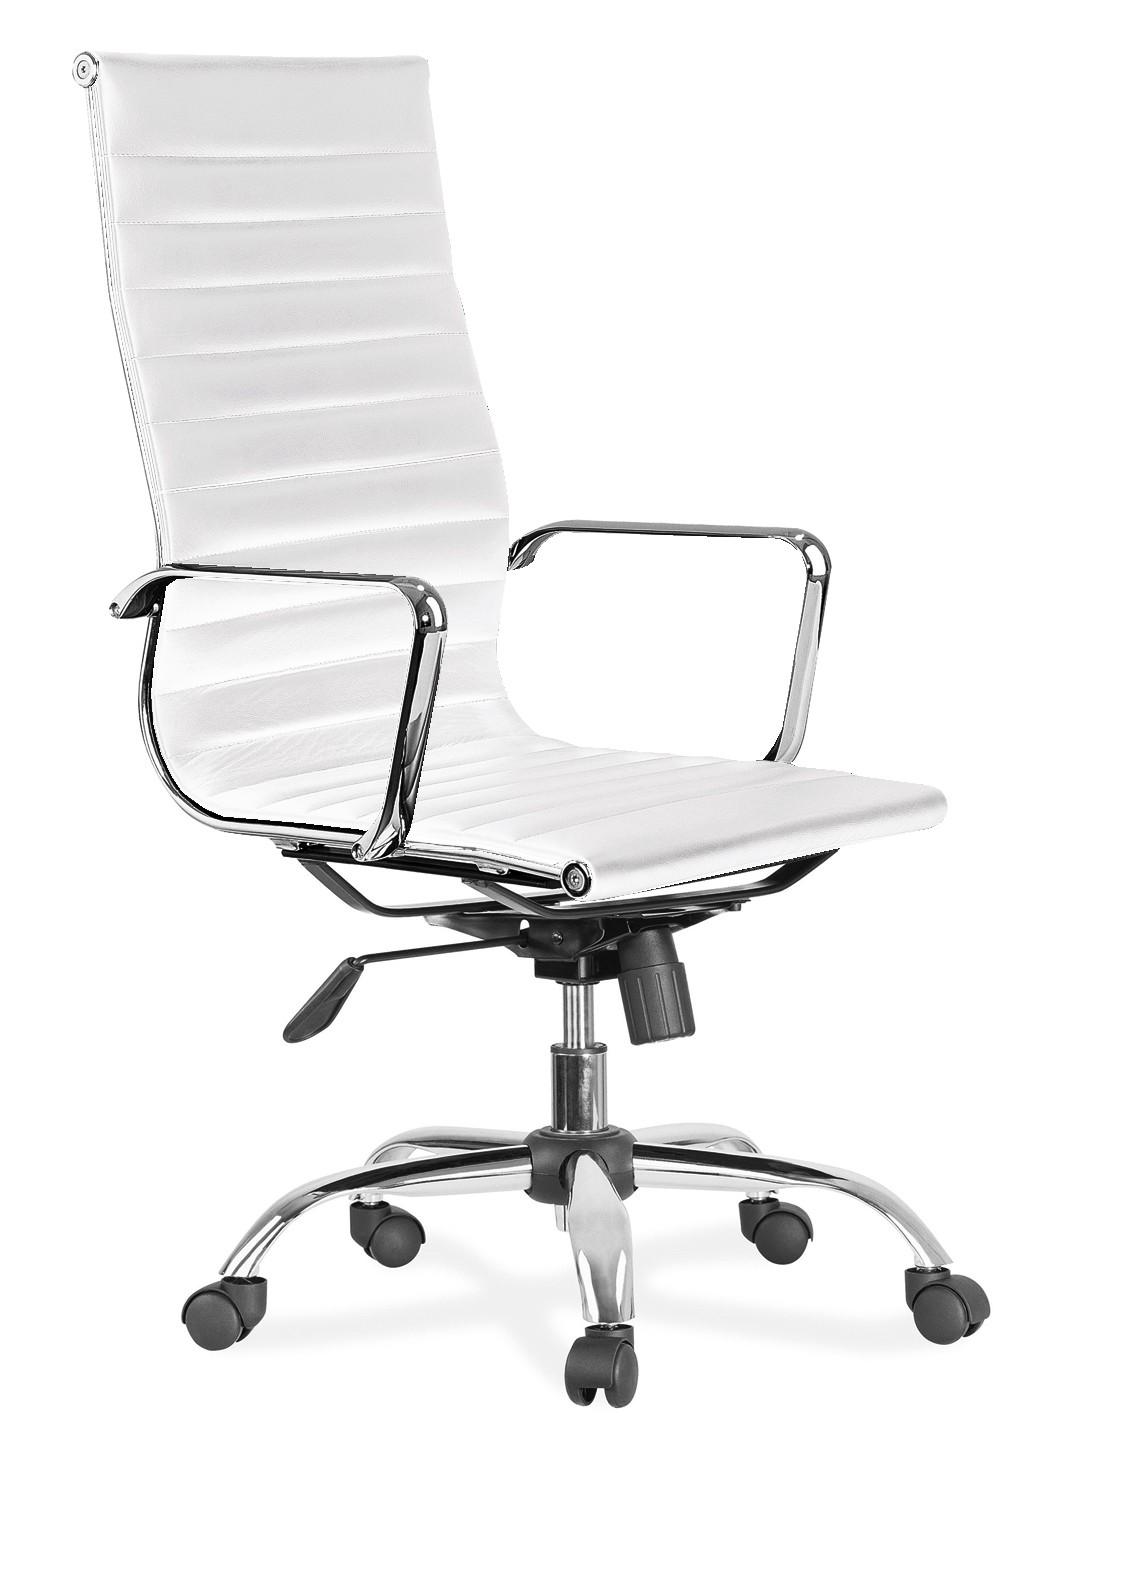 Silla de despacho mod. Office Blanca